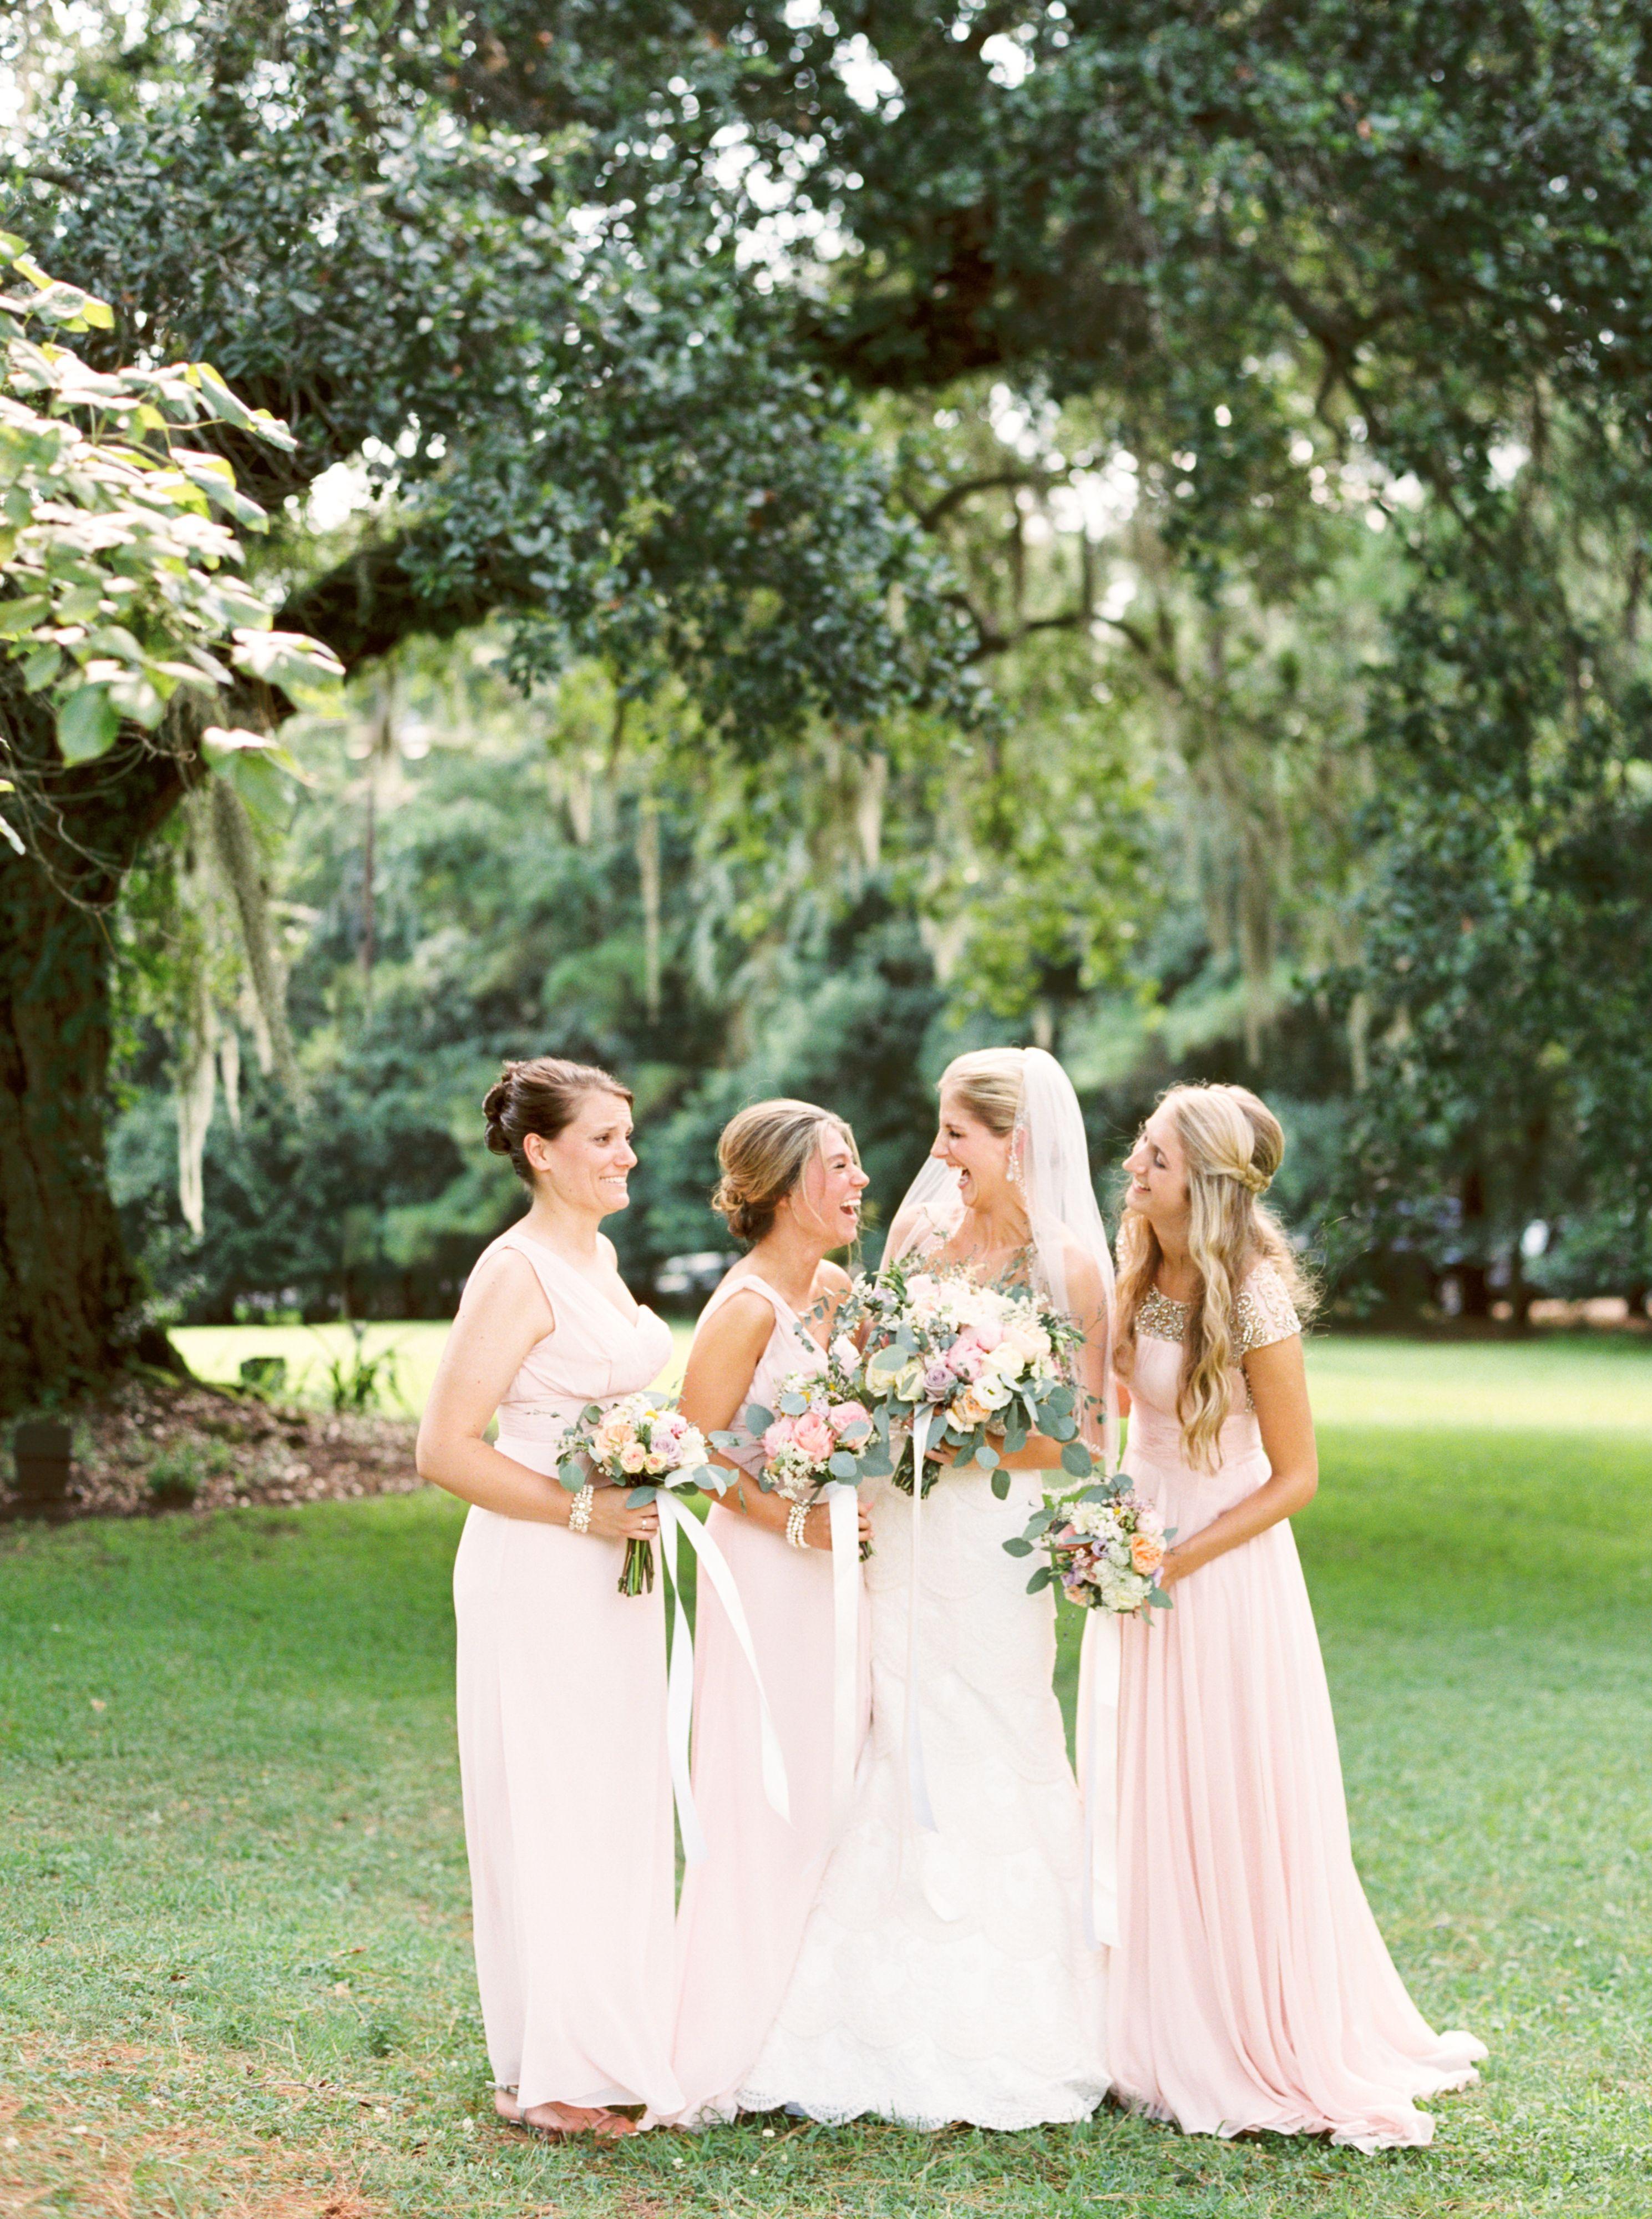 Pastel pink bridesmaid dress  Pale Pink Bridesmaid Gown  Everything Bridesmaids  Pinterest